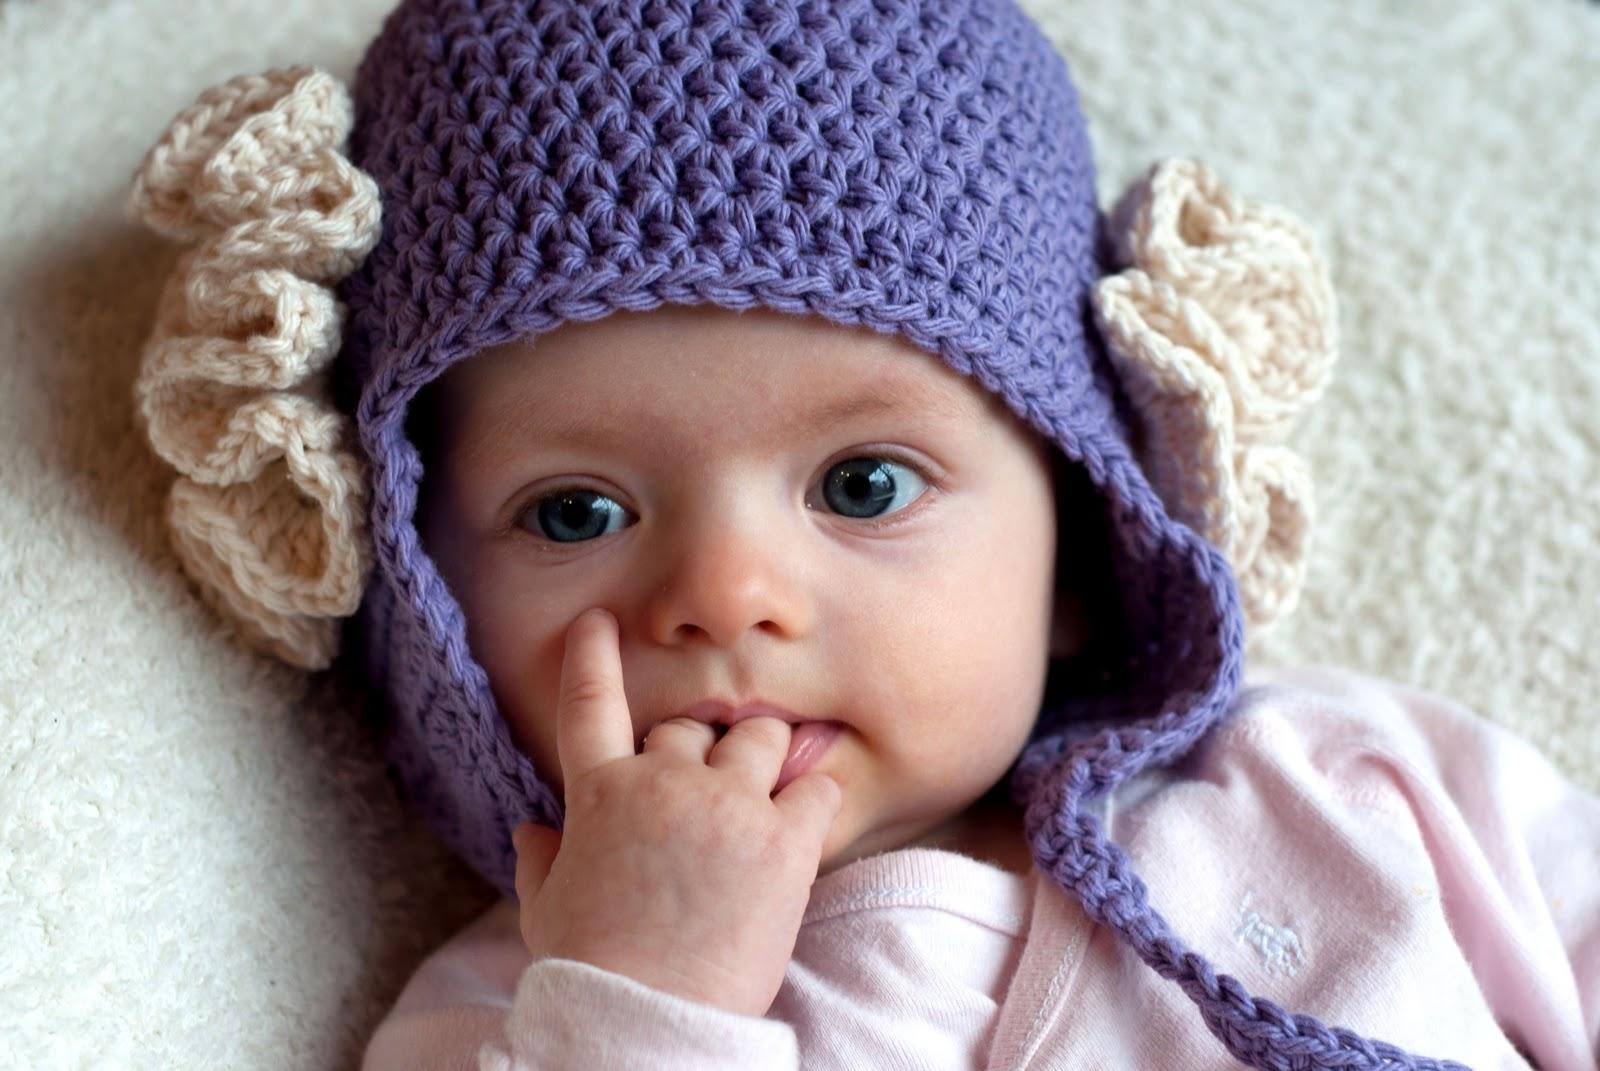 Aesthetic Nest: Crochet: Ruffled Rose Earflap Hat for Baby (Pattern)